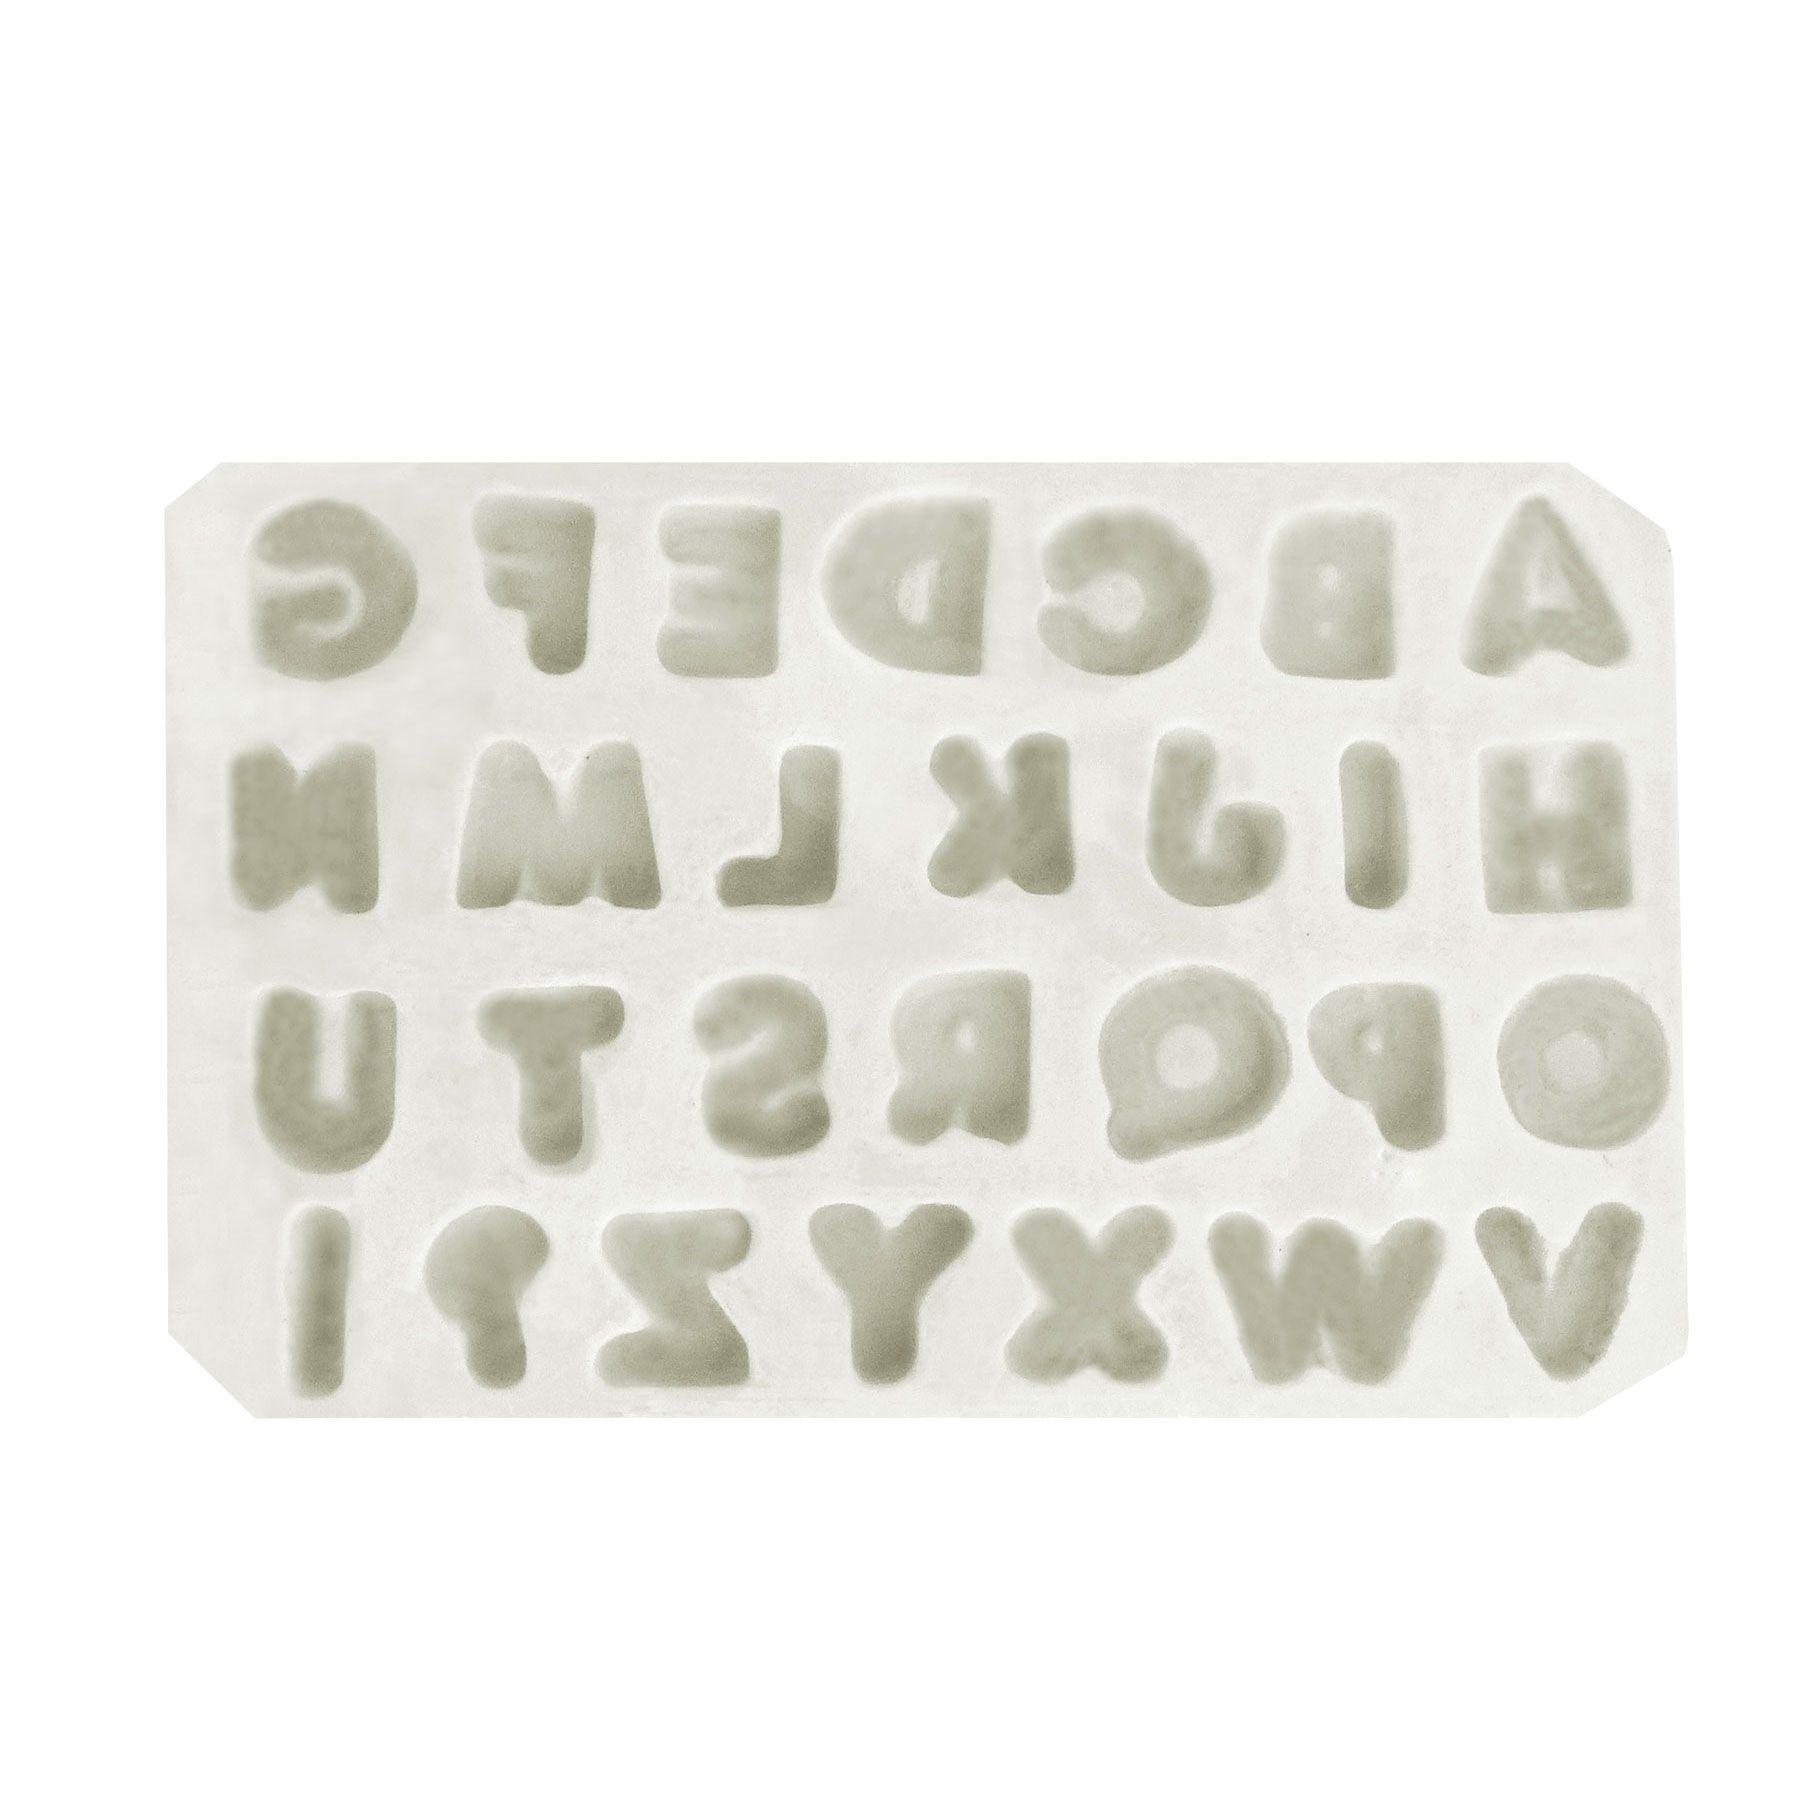 Molde de Silicone Letras (+) Pequenas - Gummies